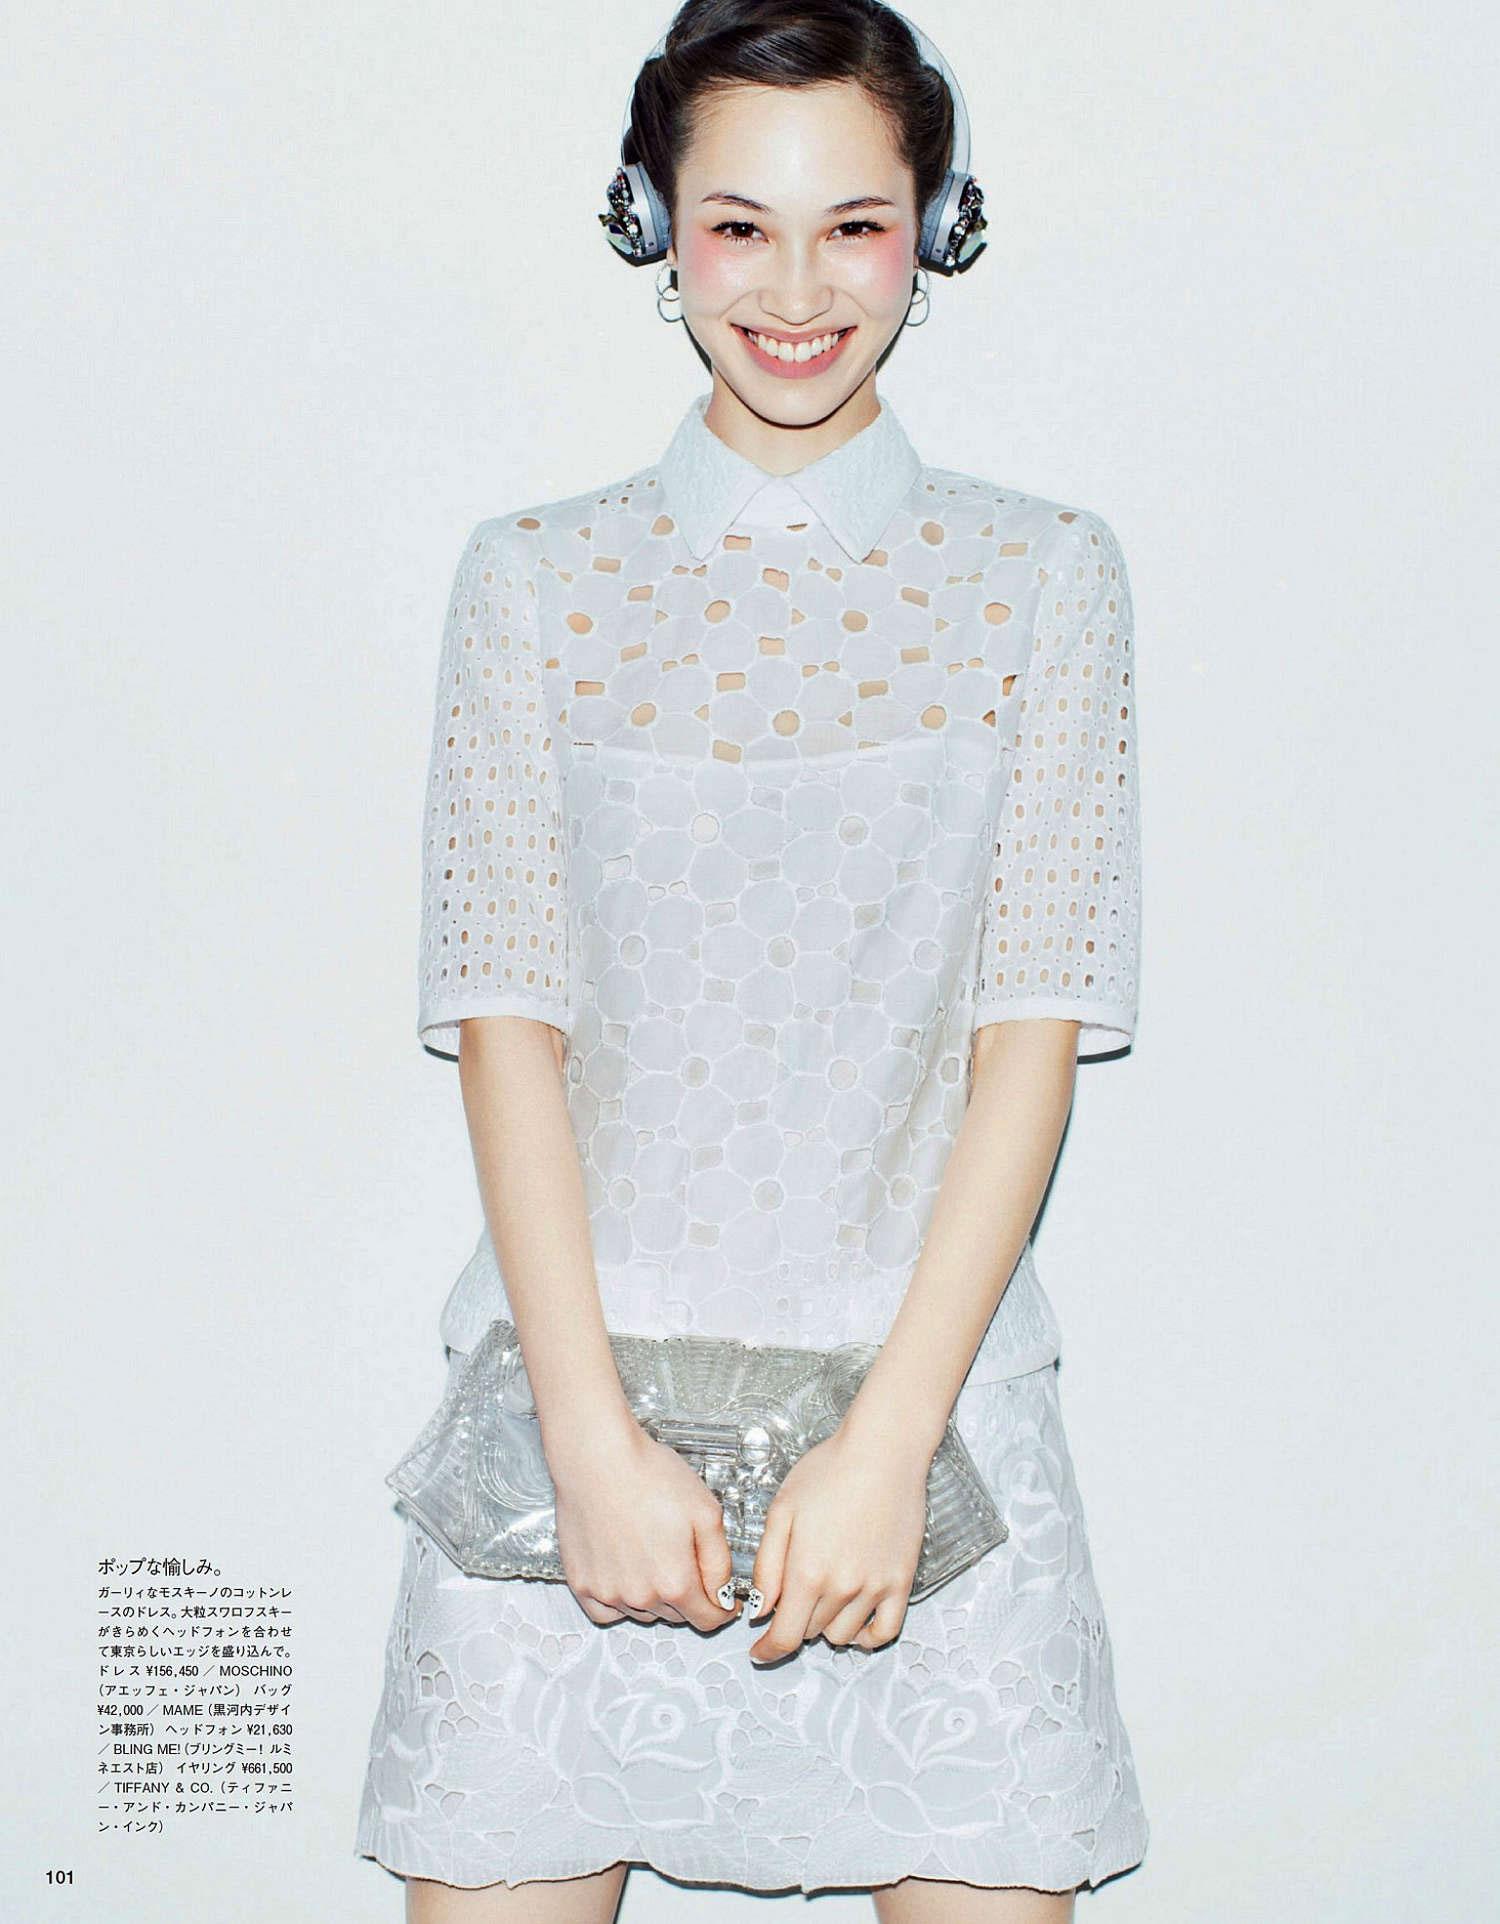 Kiko Mizuhara Japanese Vogue Magazine